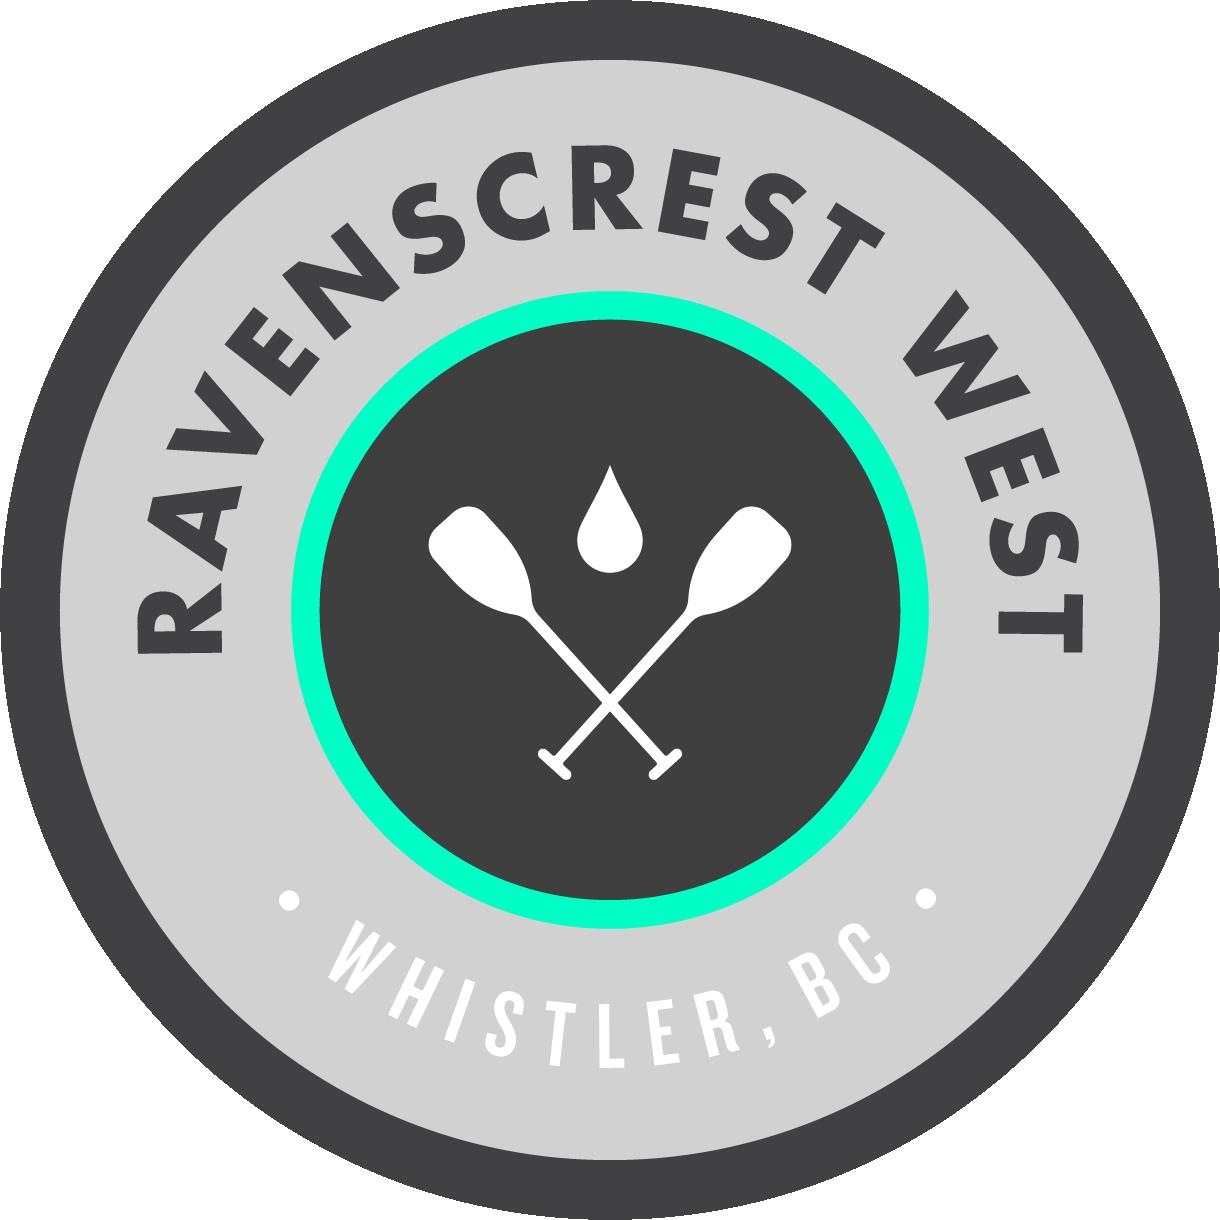 Ravenscrest West - Ride On Whistler